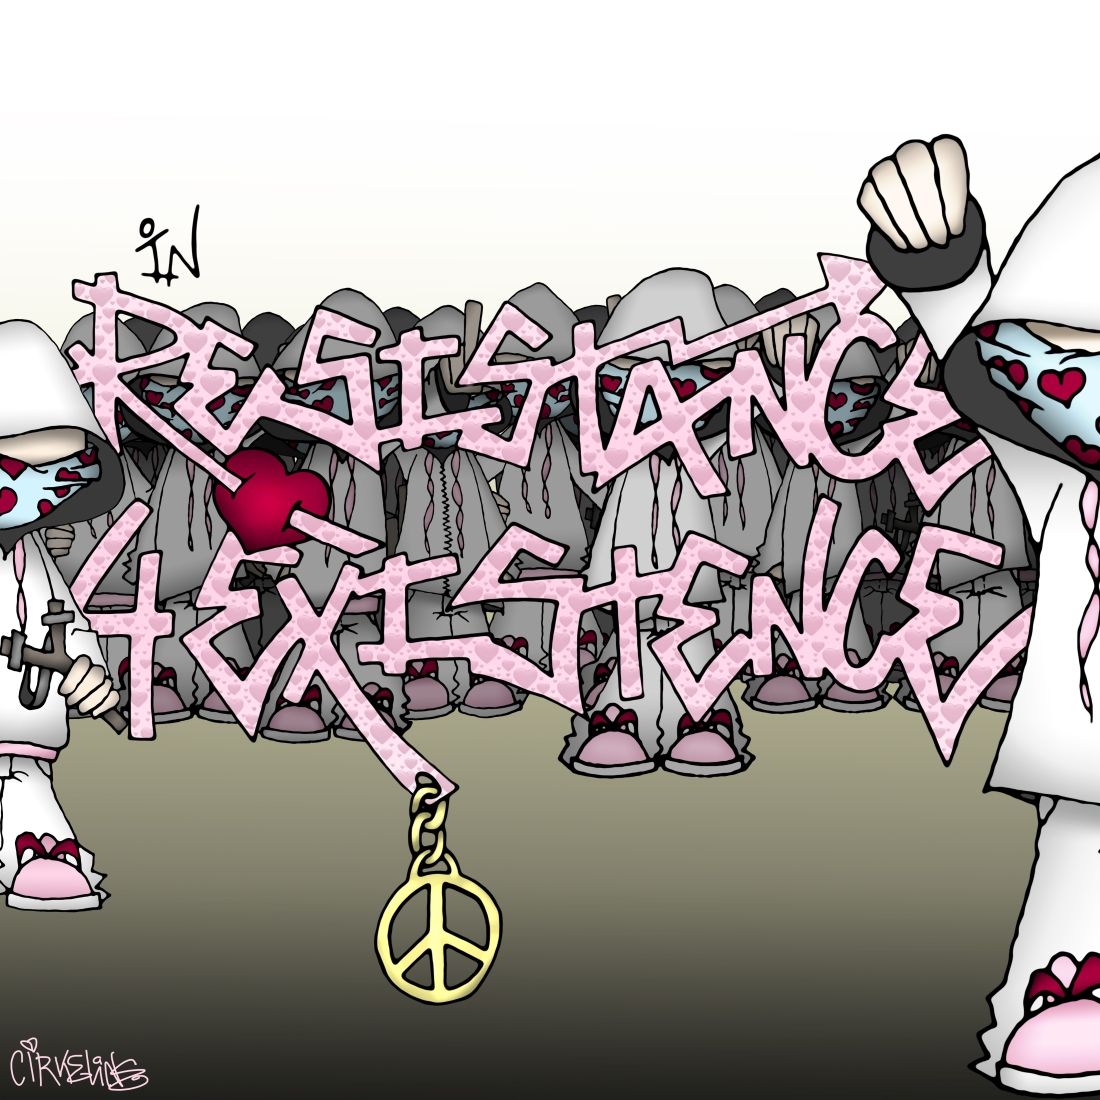 resist_exist